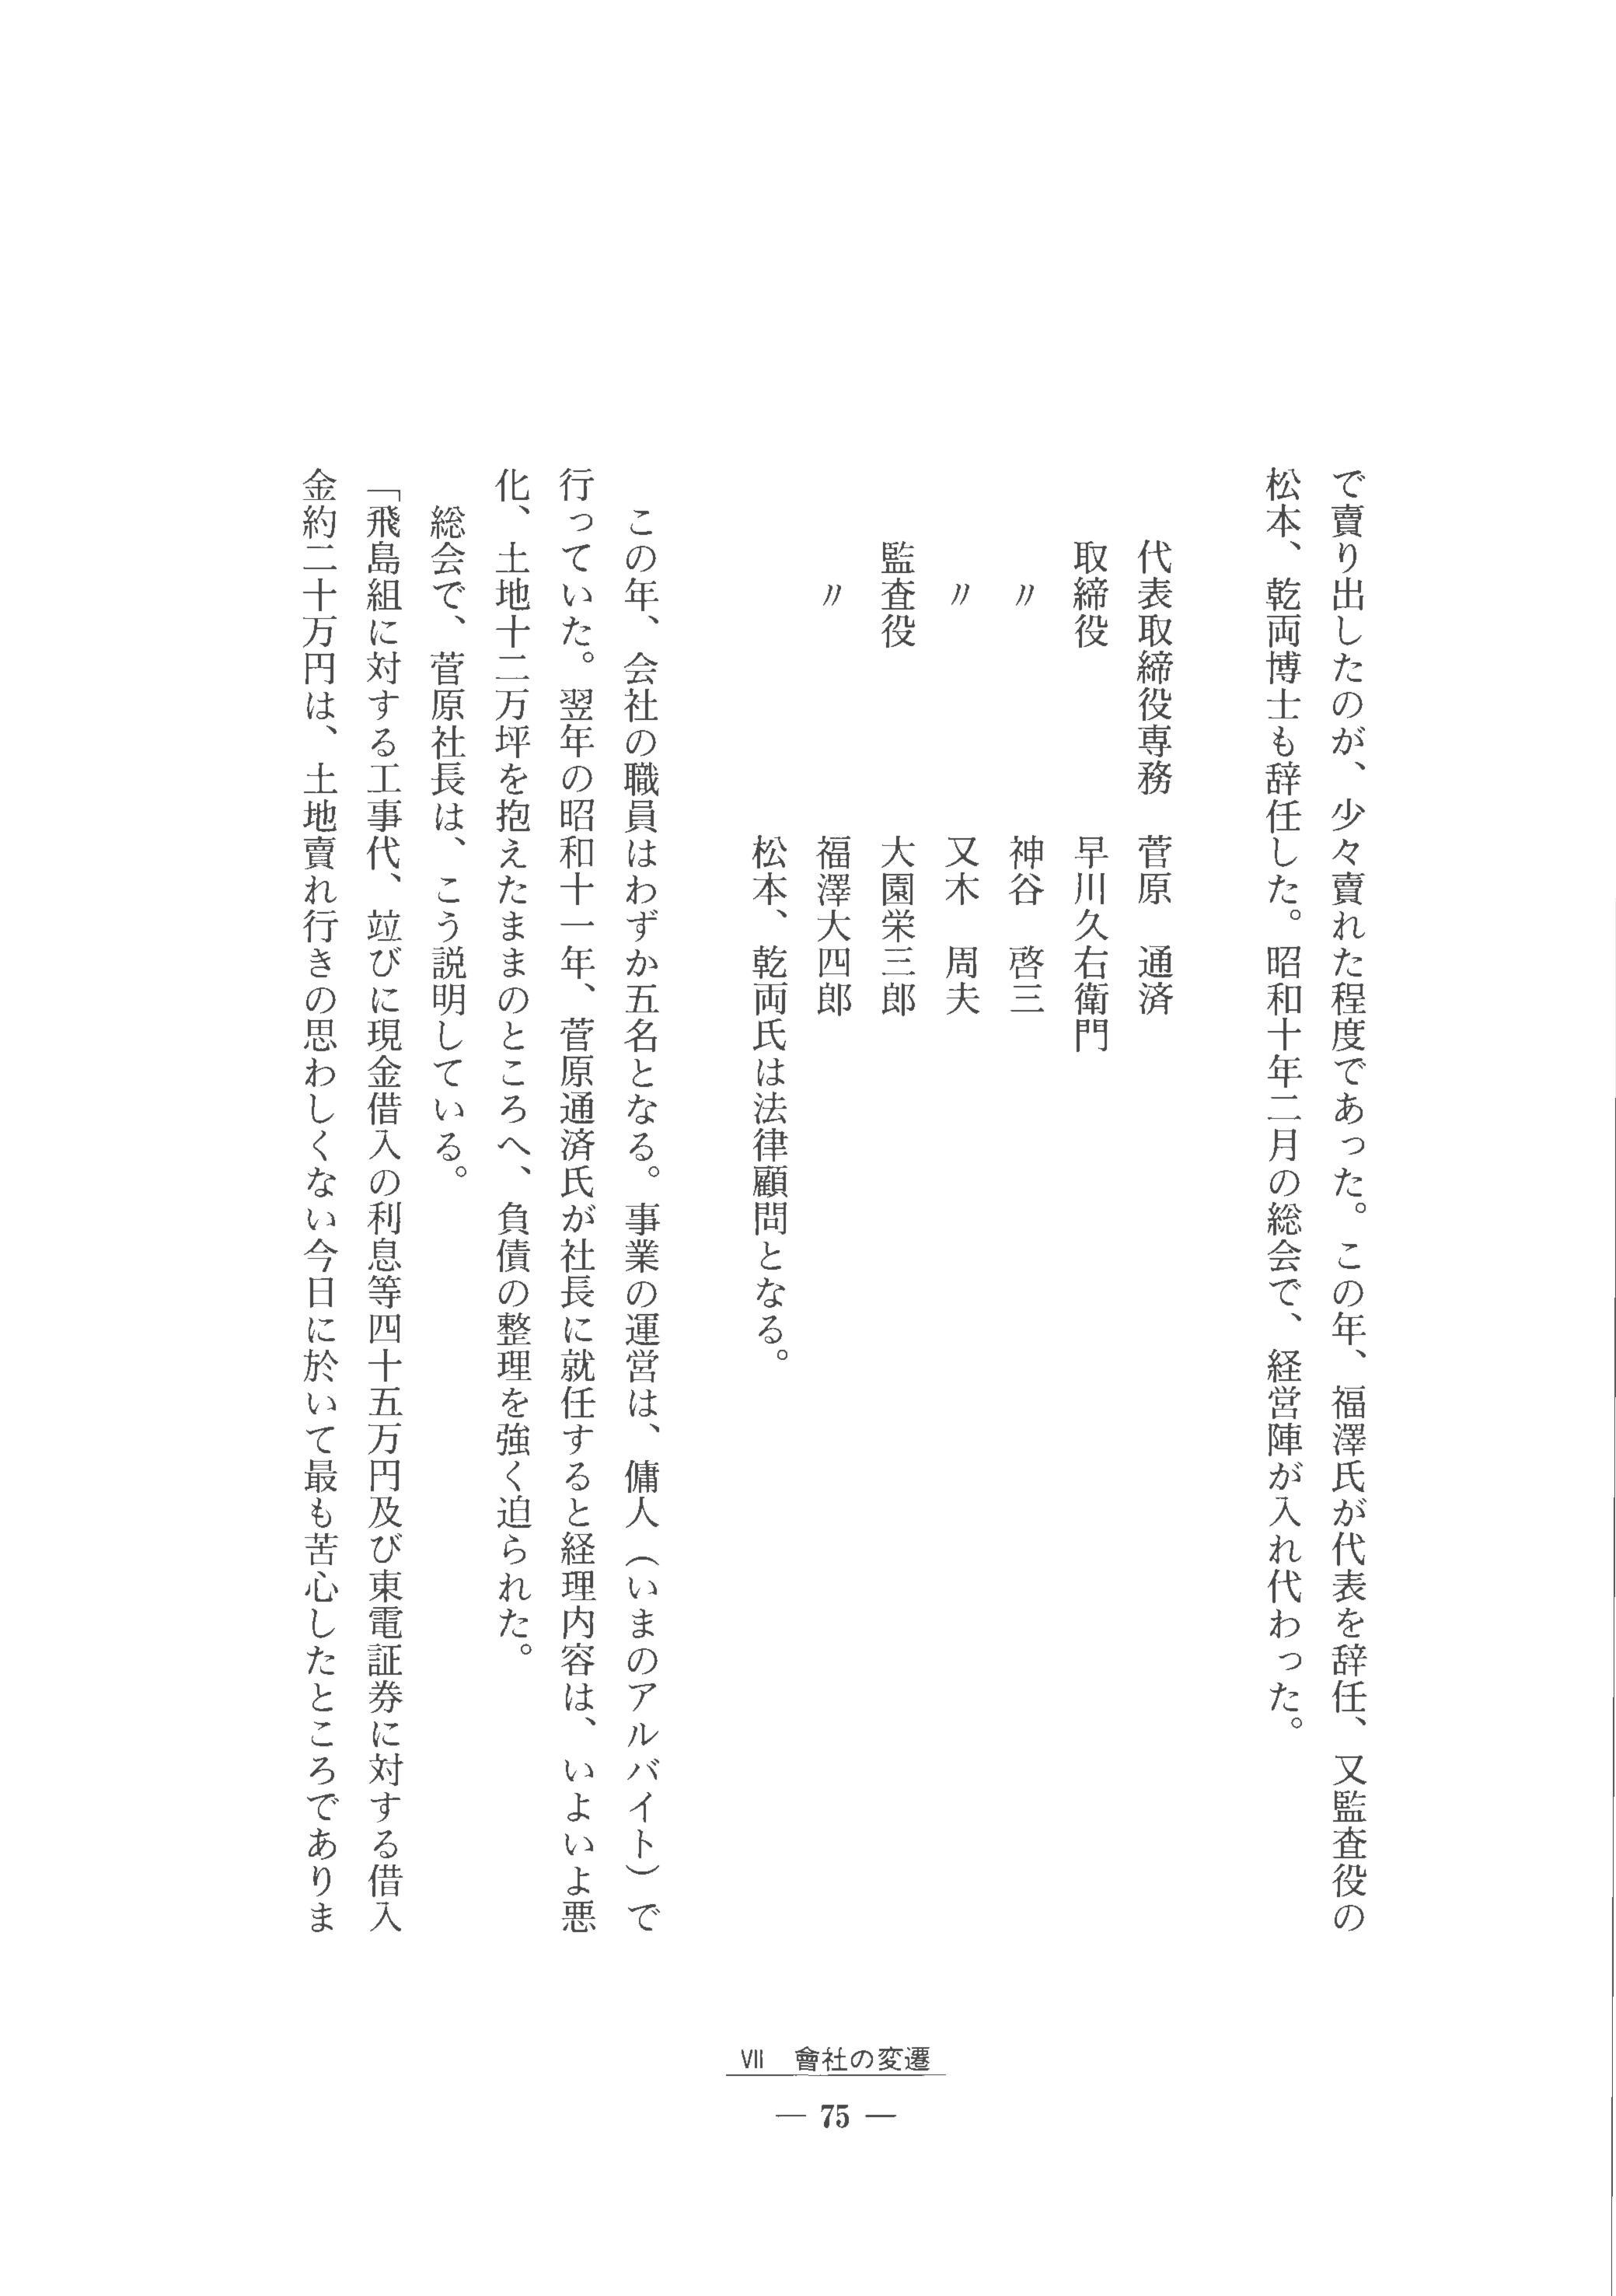 Image 77.jpeg